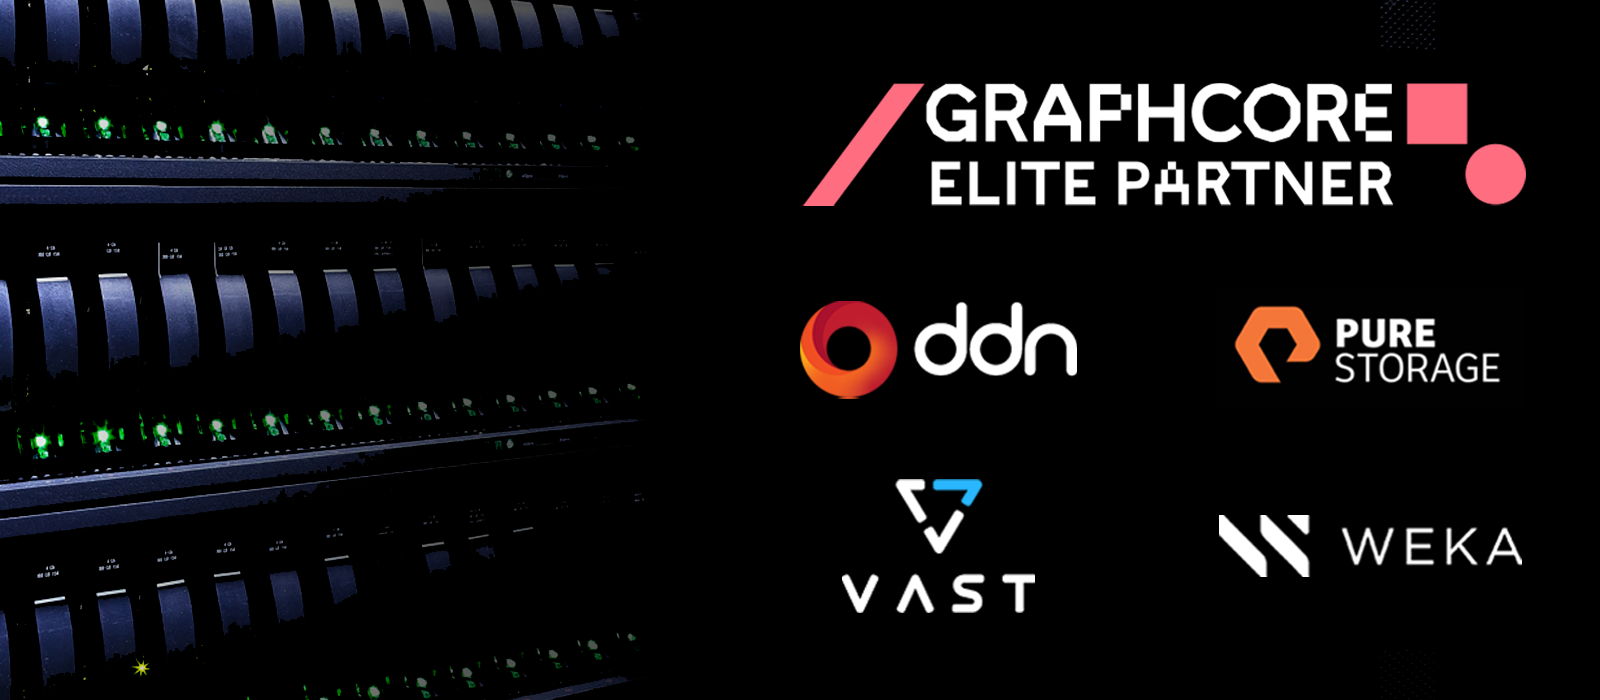 Graphcore adds leading storage providers to Elite Partner Program